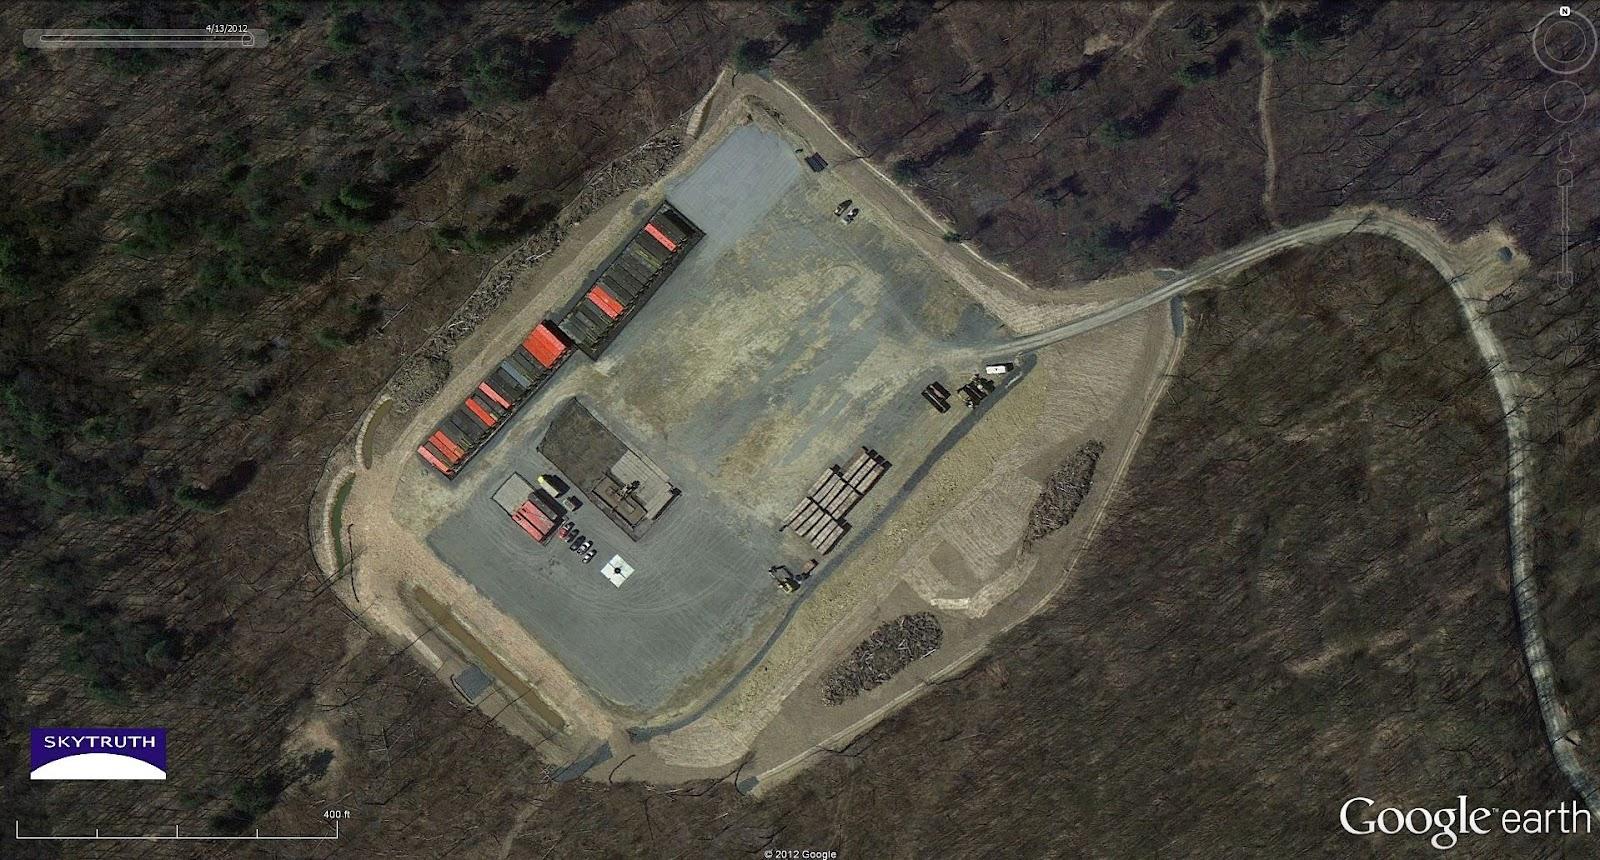 New Imagery in Google Earth – Fracking Revealed – SkyTruth